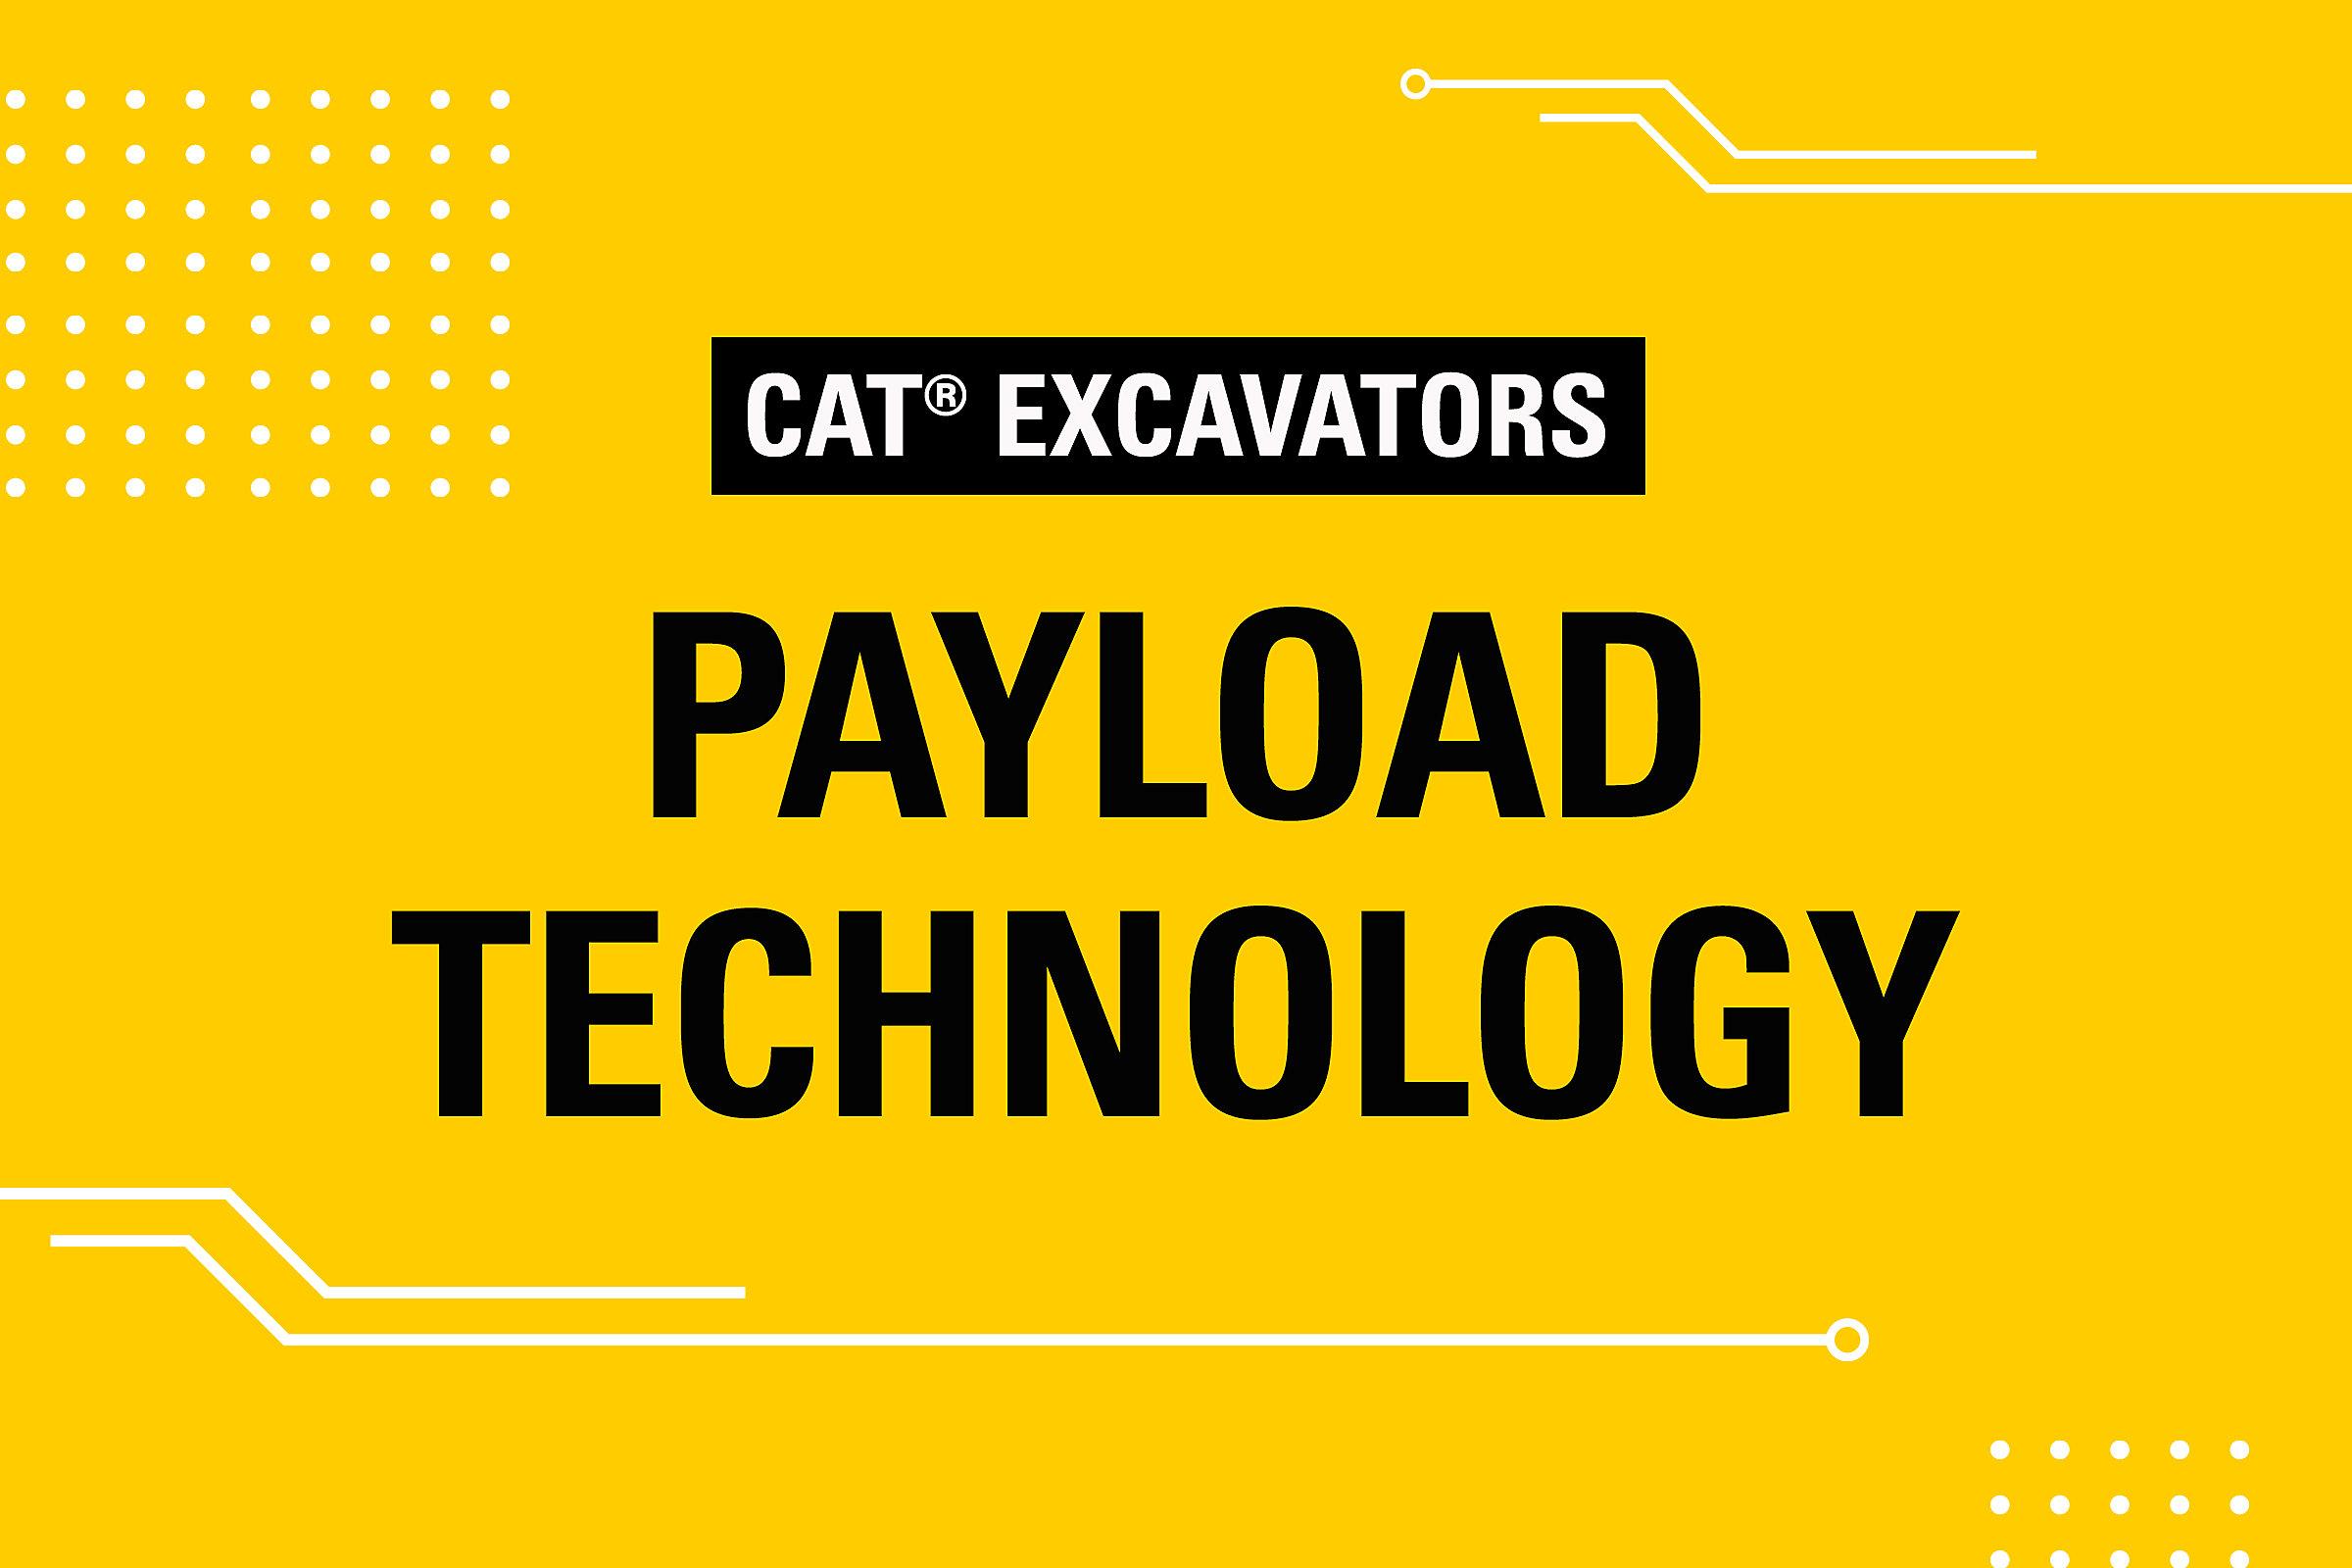 Payload Technology